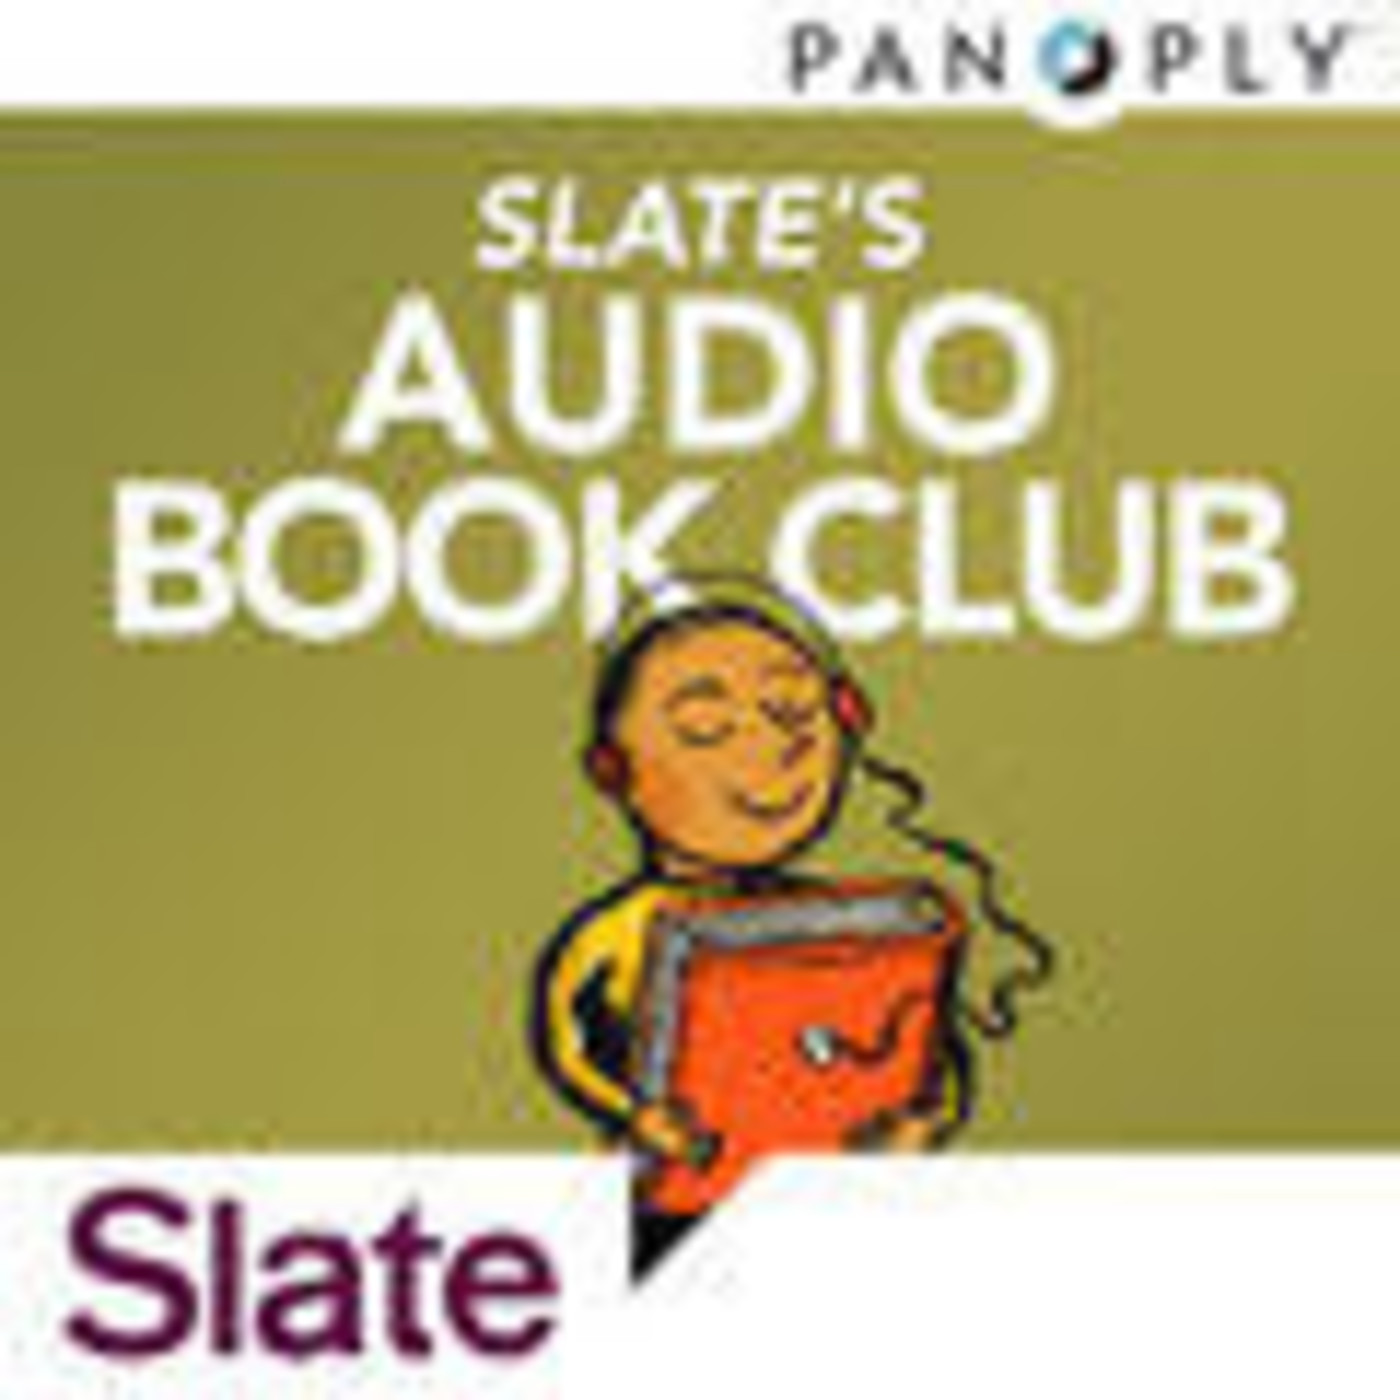 Slate Magazine/Panoply